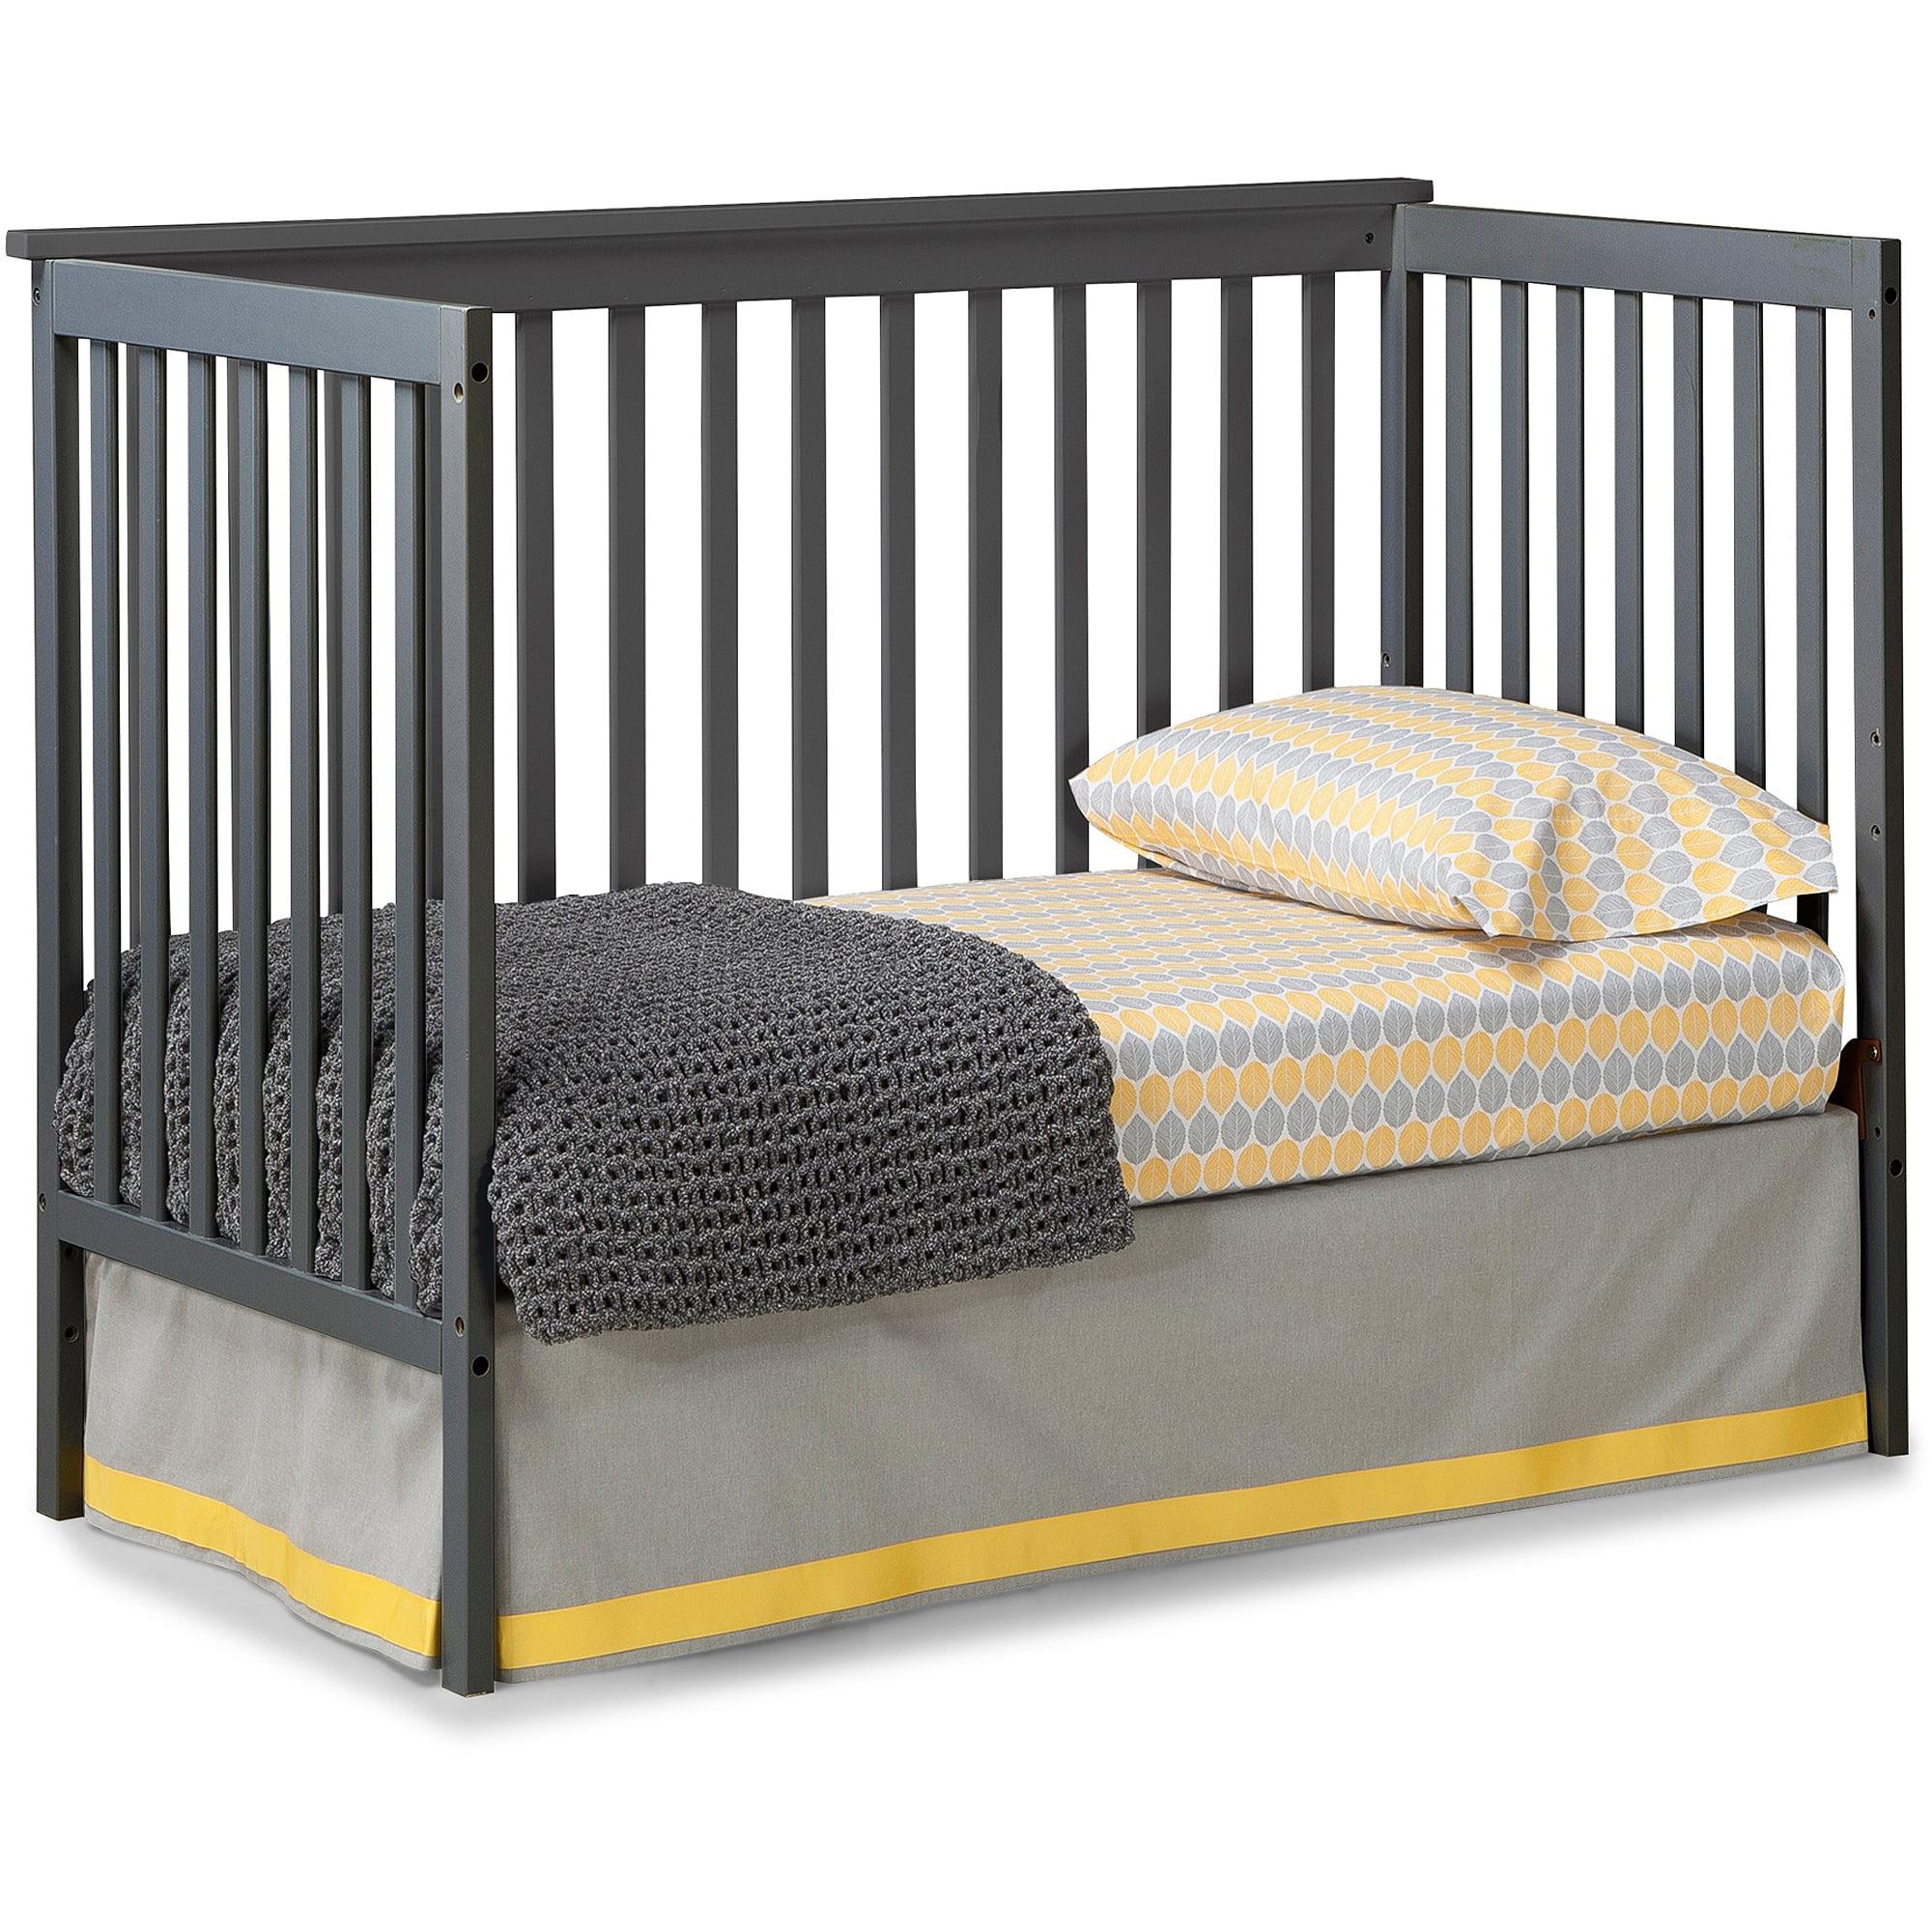 Stork craft crib reviews - Stork Craft Crib Reviews 18